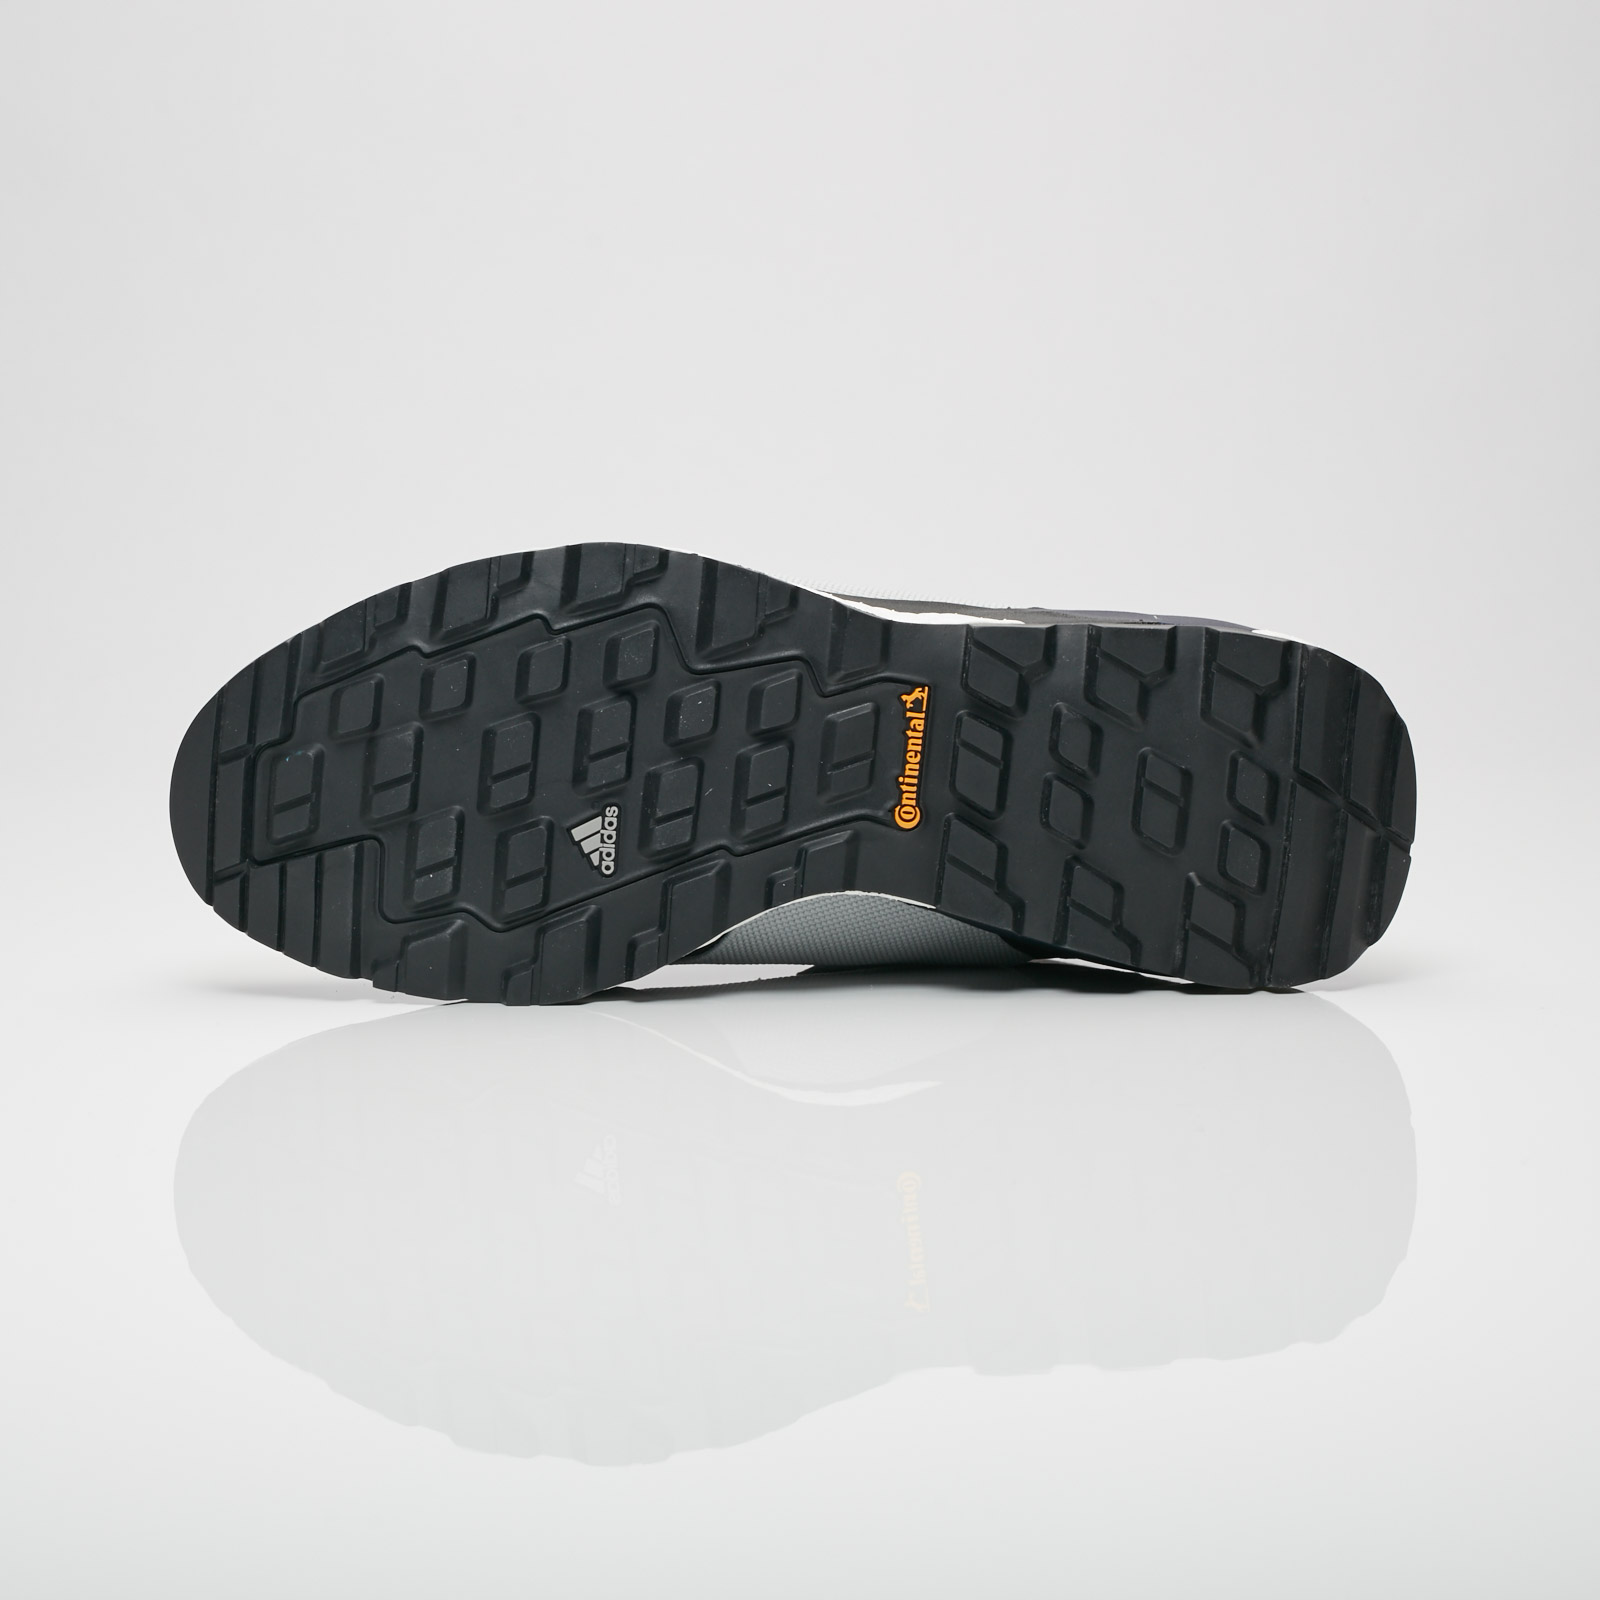 adidas ADO Ultimate Boot Day One Edition Herren Outdoor